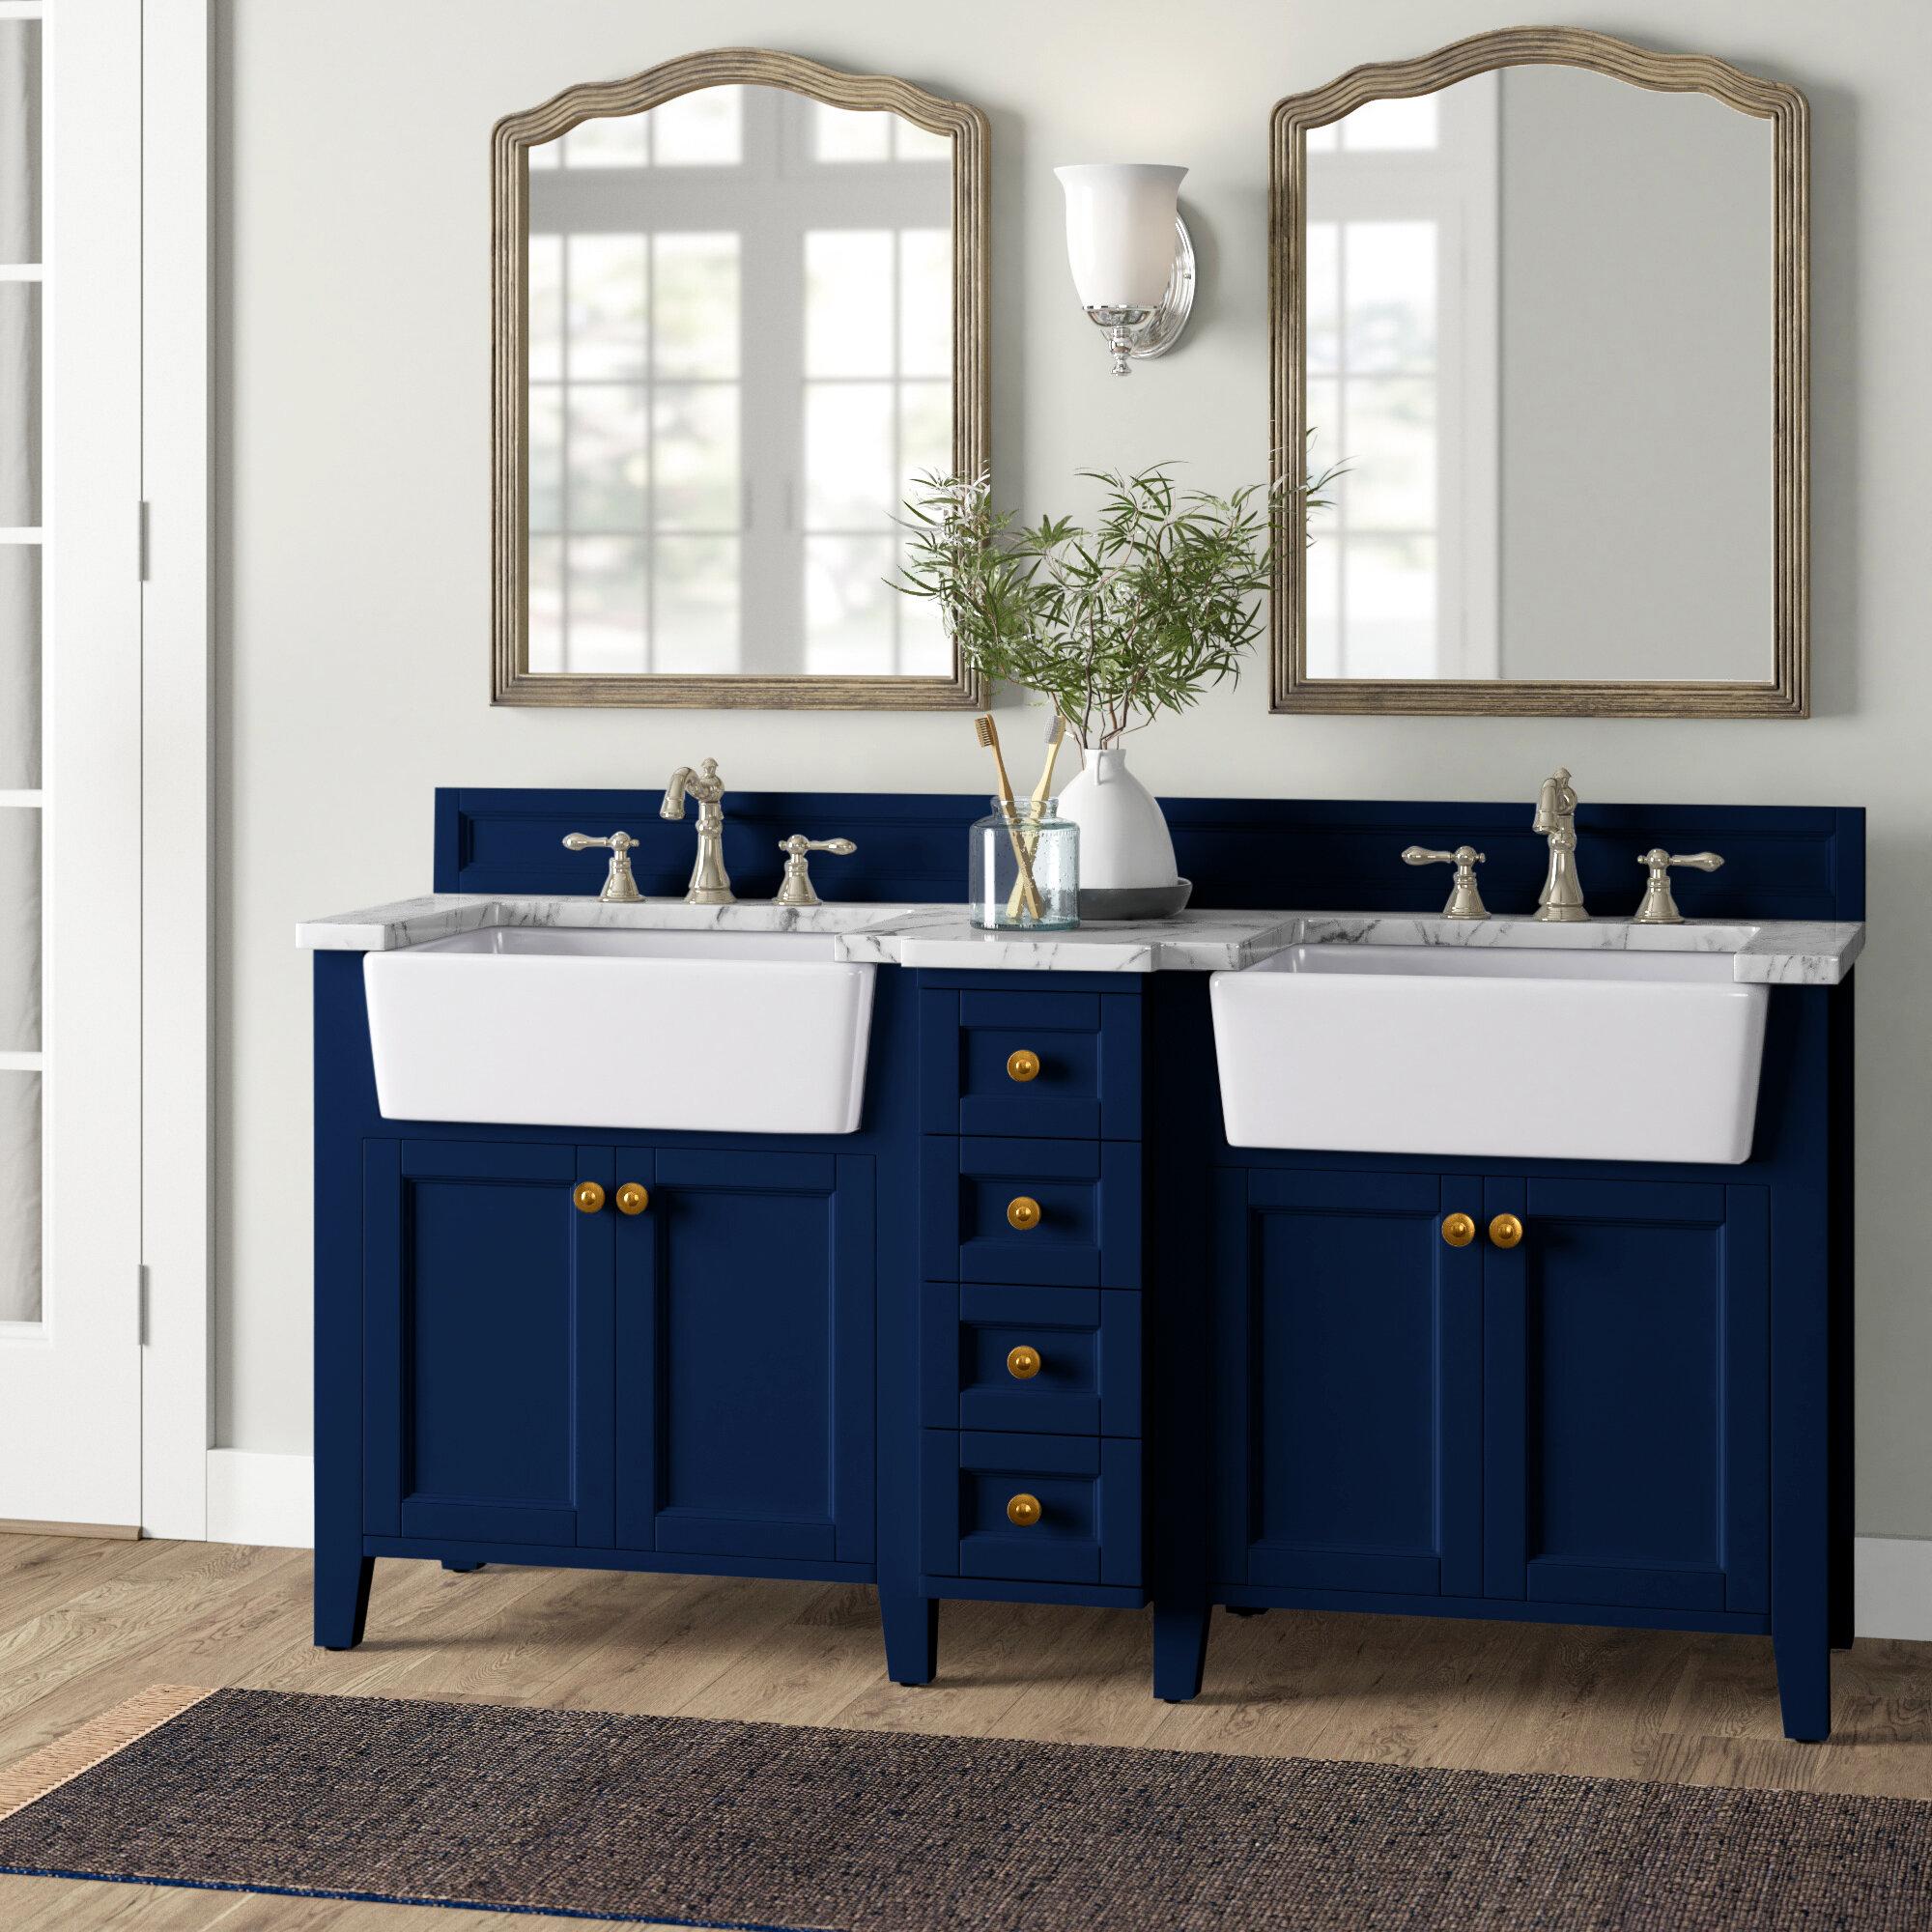 Birch Lane Diep 60 Double Bathroom Vanity Set Reviews Wayfair